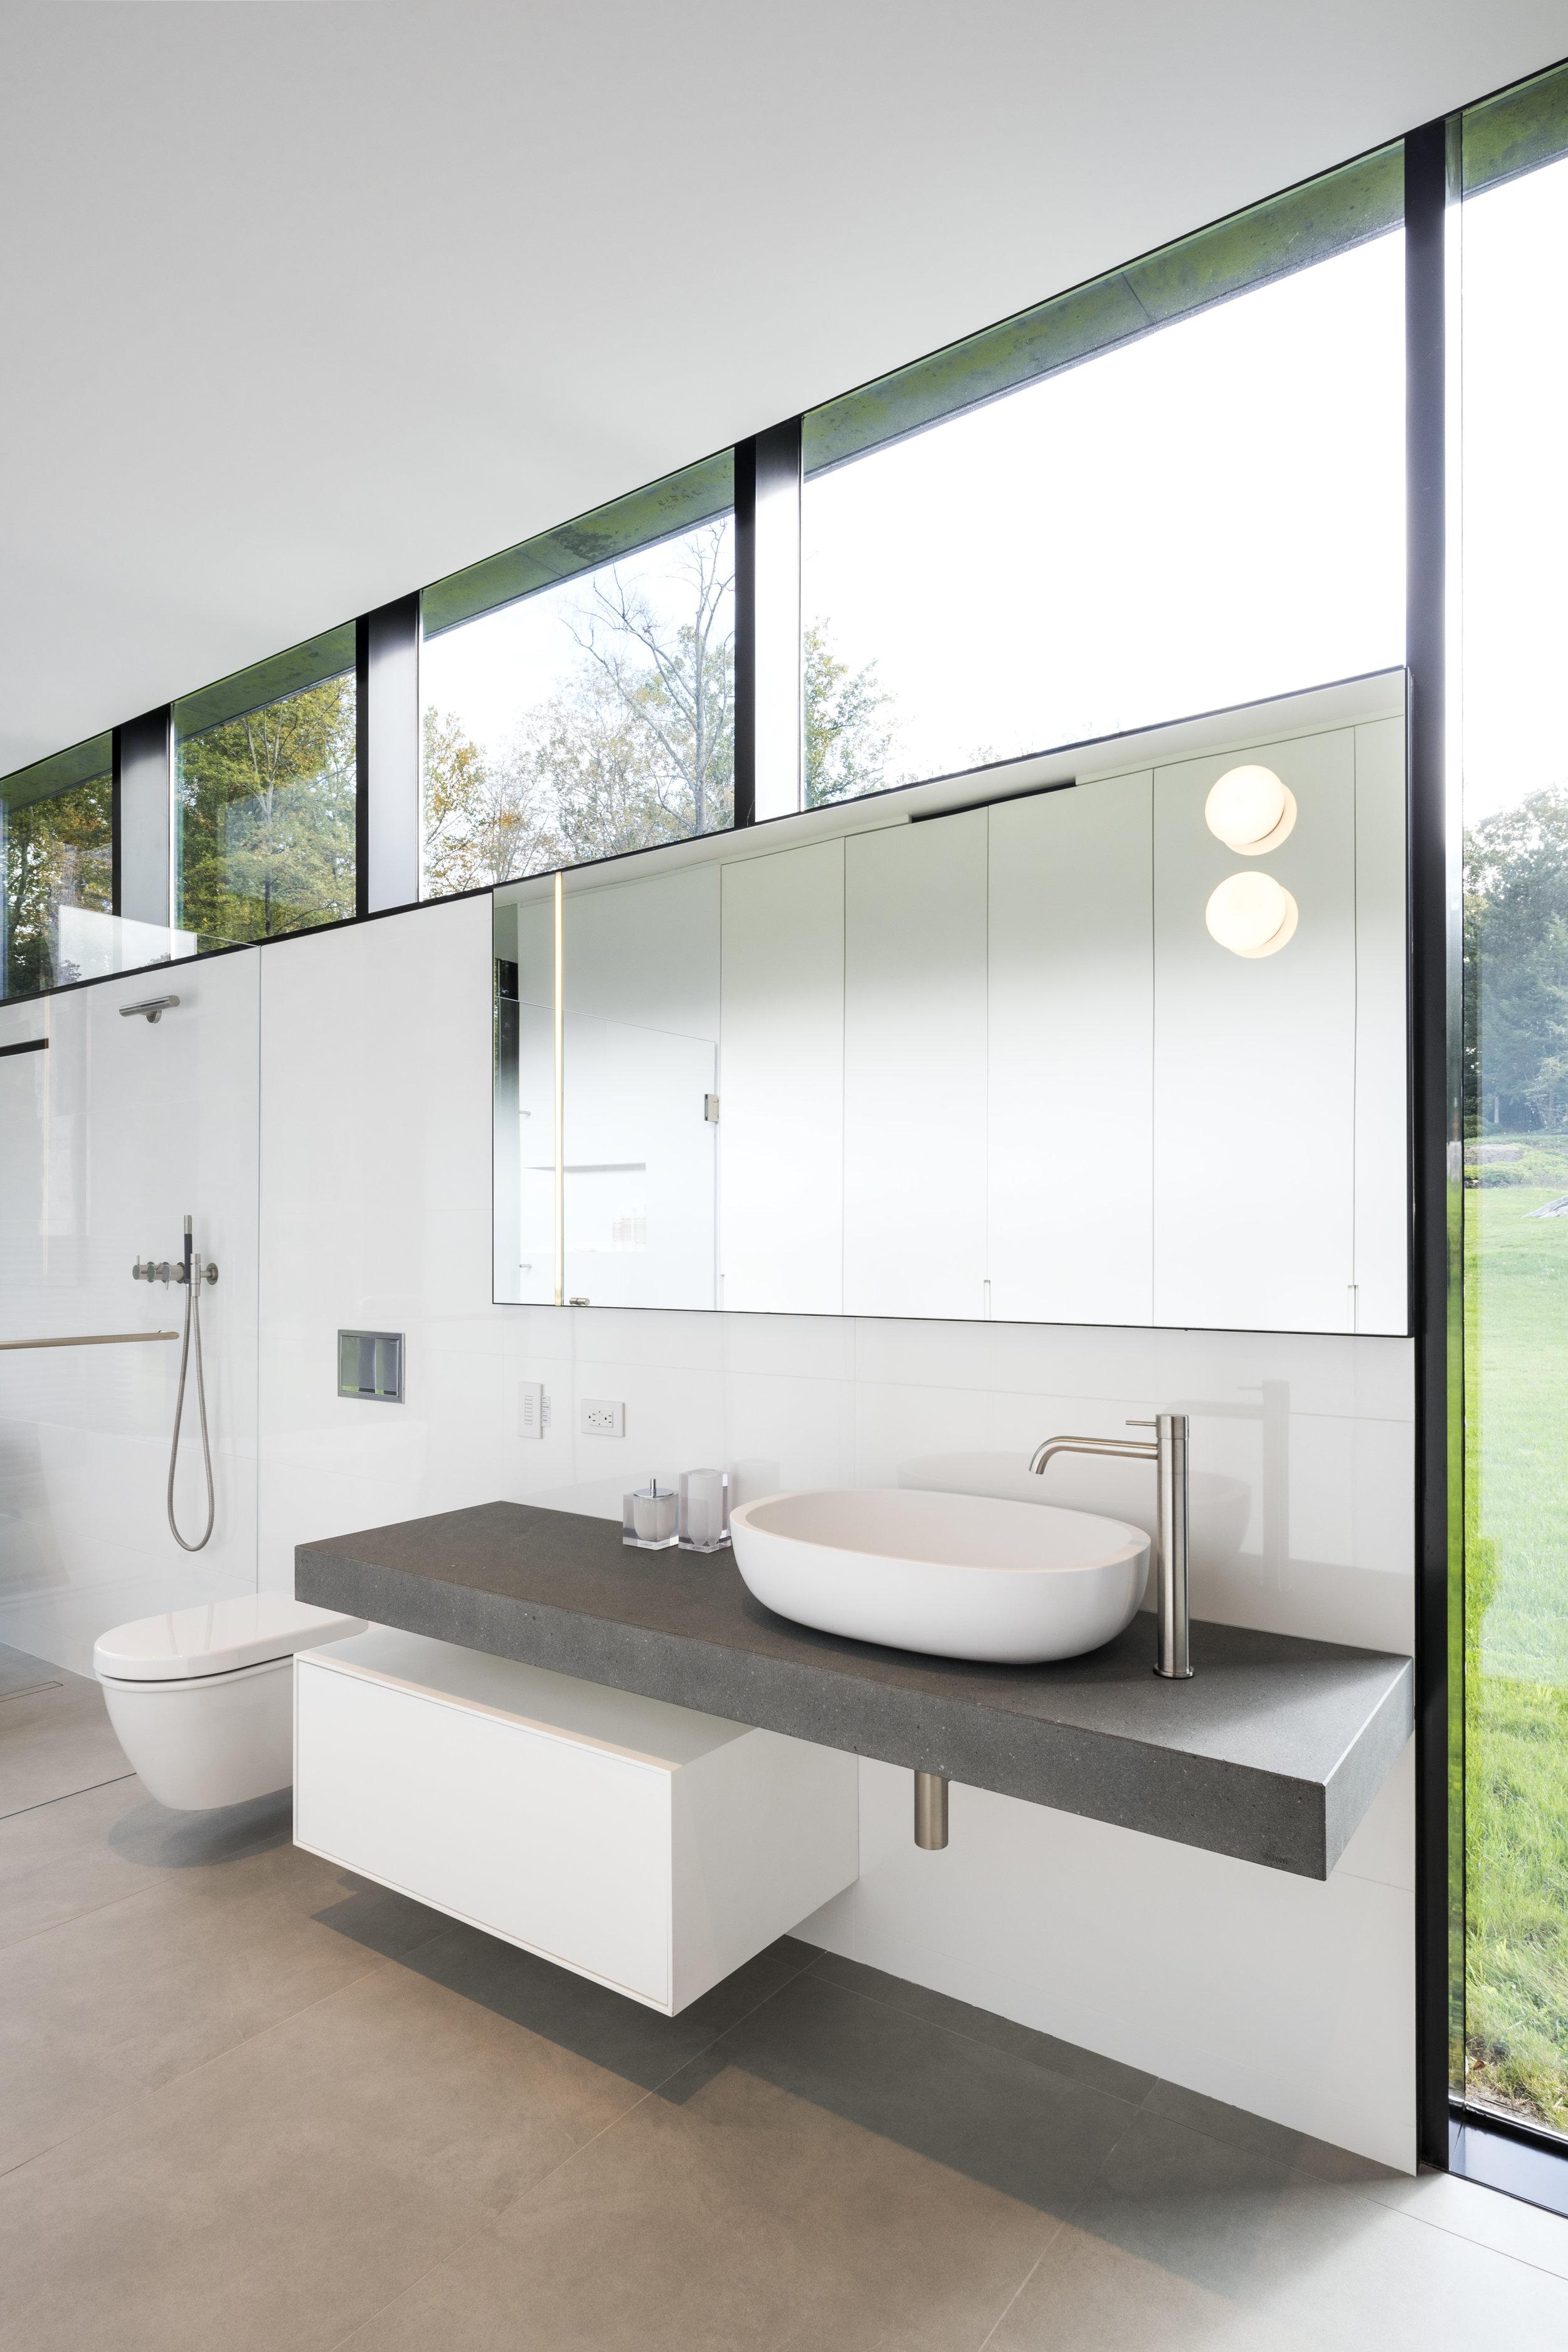 Luxury Bathroom with Stone countertop